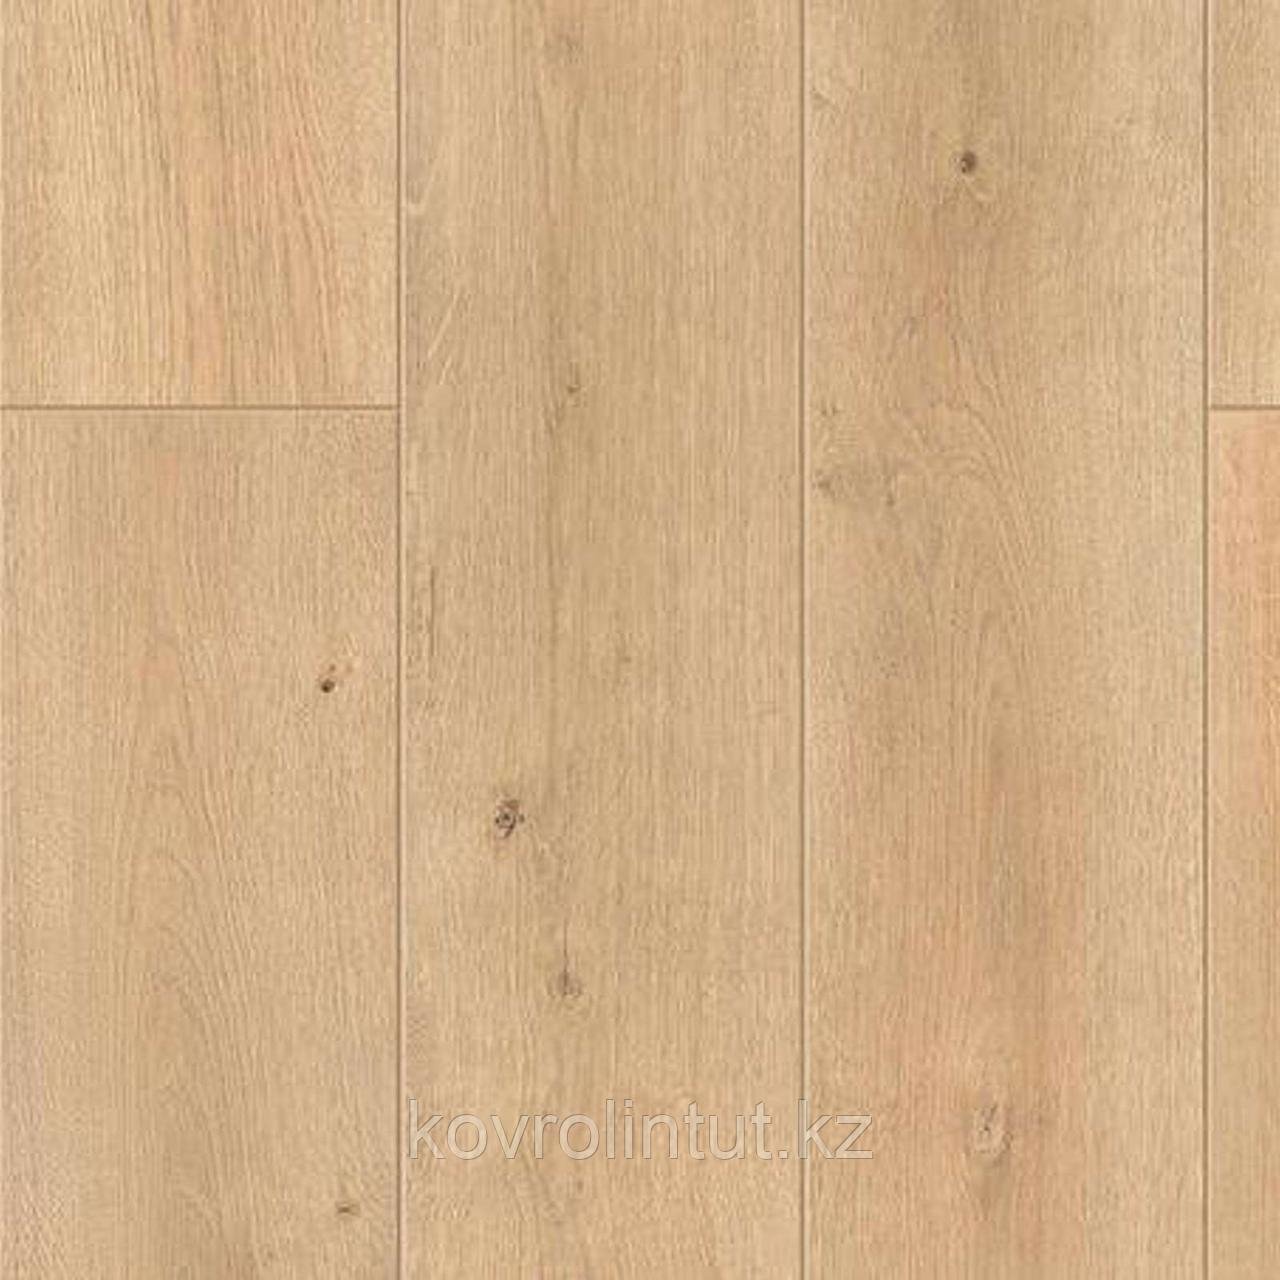 Ламинат Sommer коллекция Nordica Дуб Зеландия 1 кл 504486003, 194х1292х8мм, 32кл (8 шт/2,005м2)